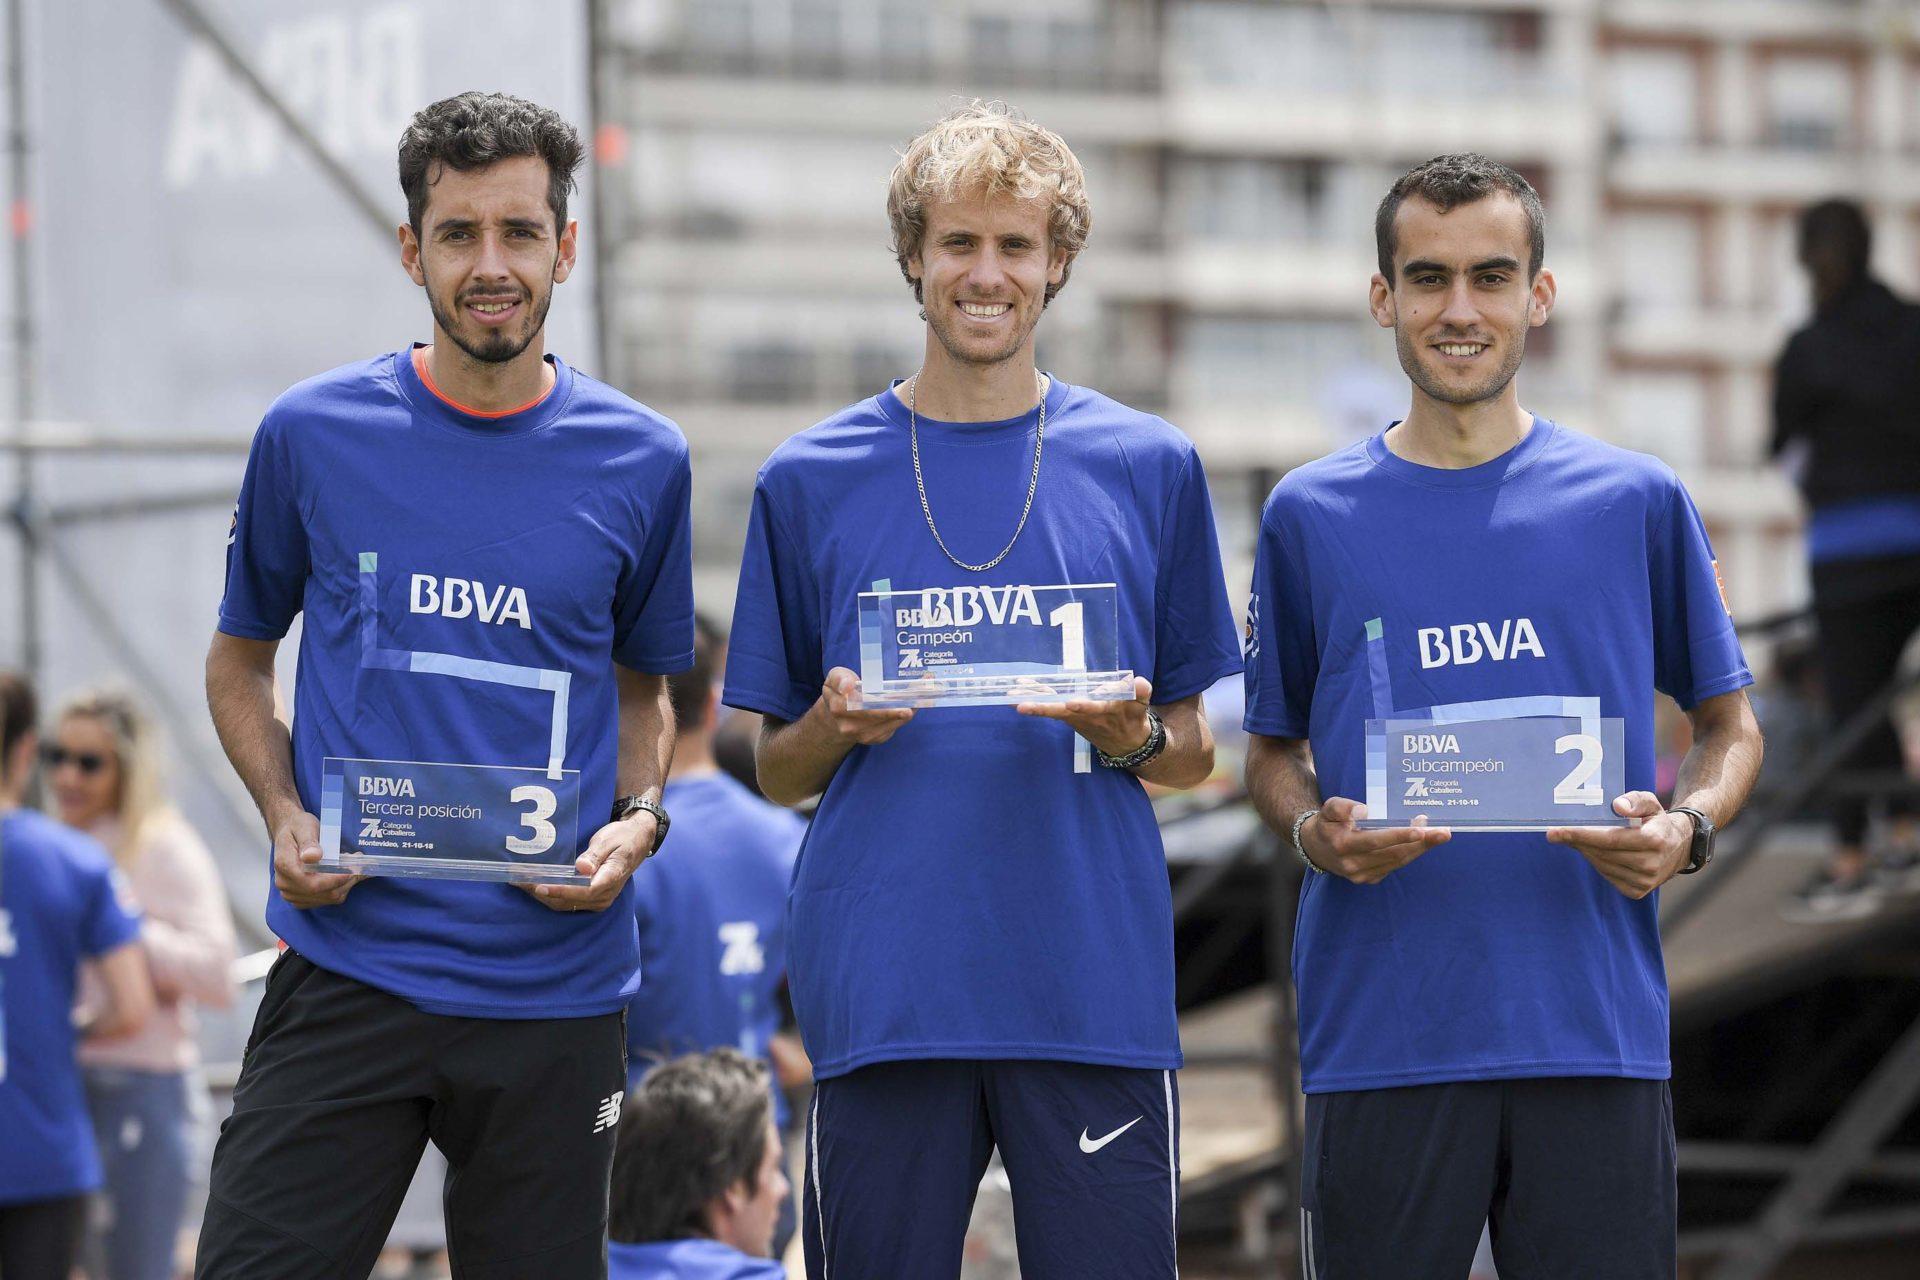 Ganadores rama masculina 7K BBVA 2018